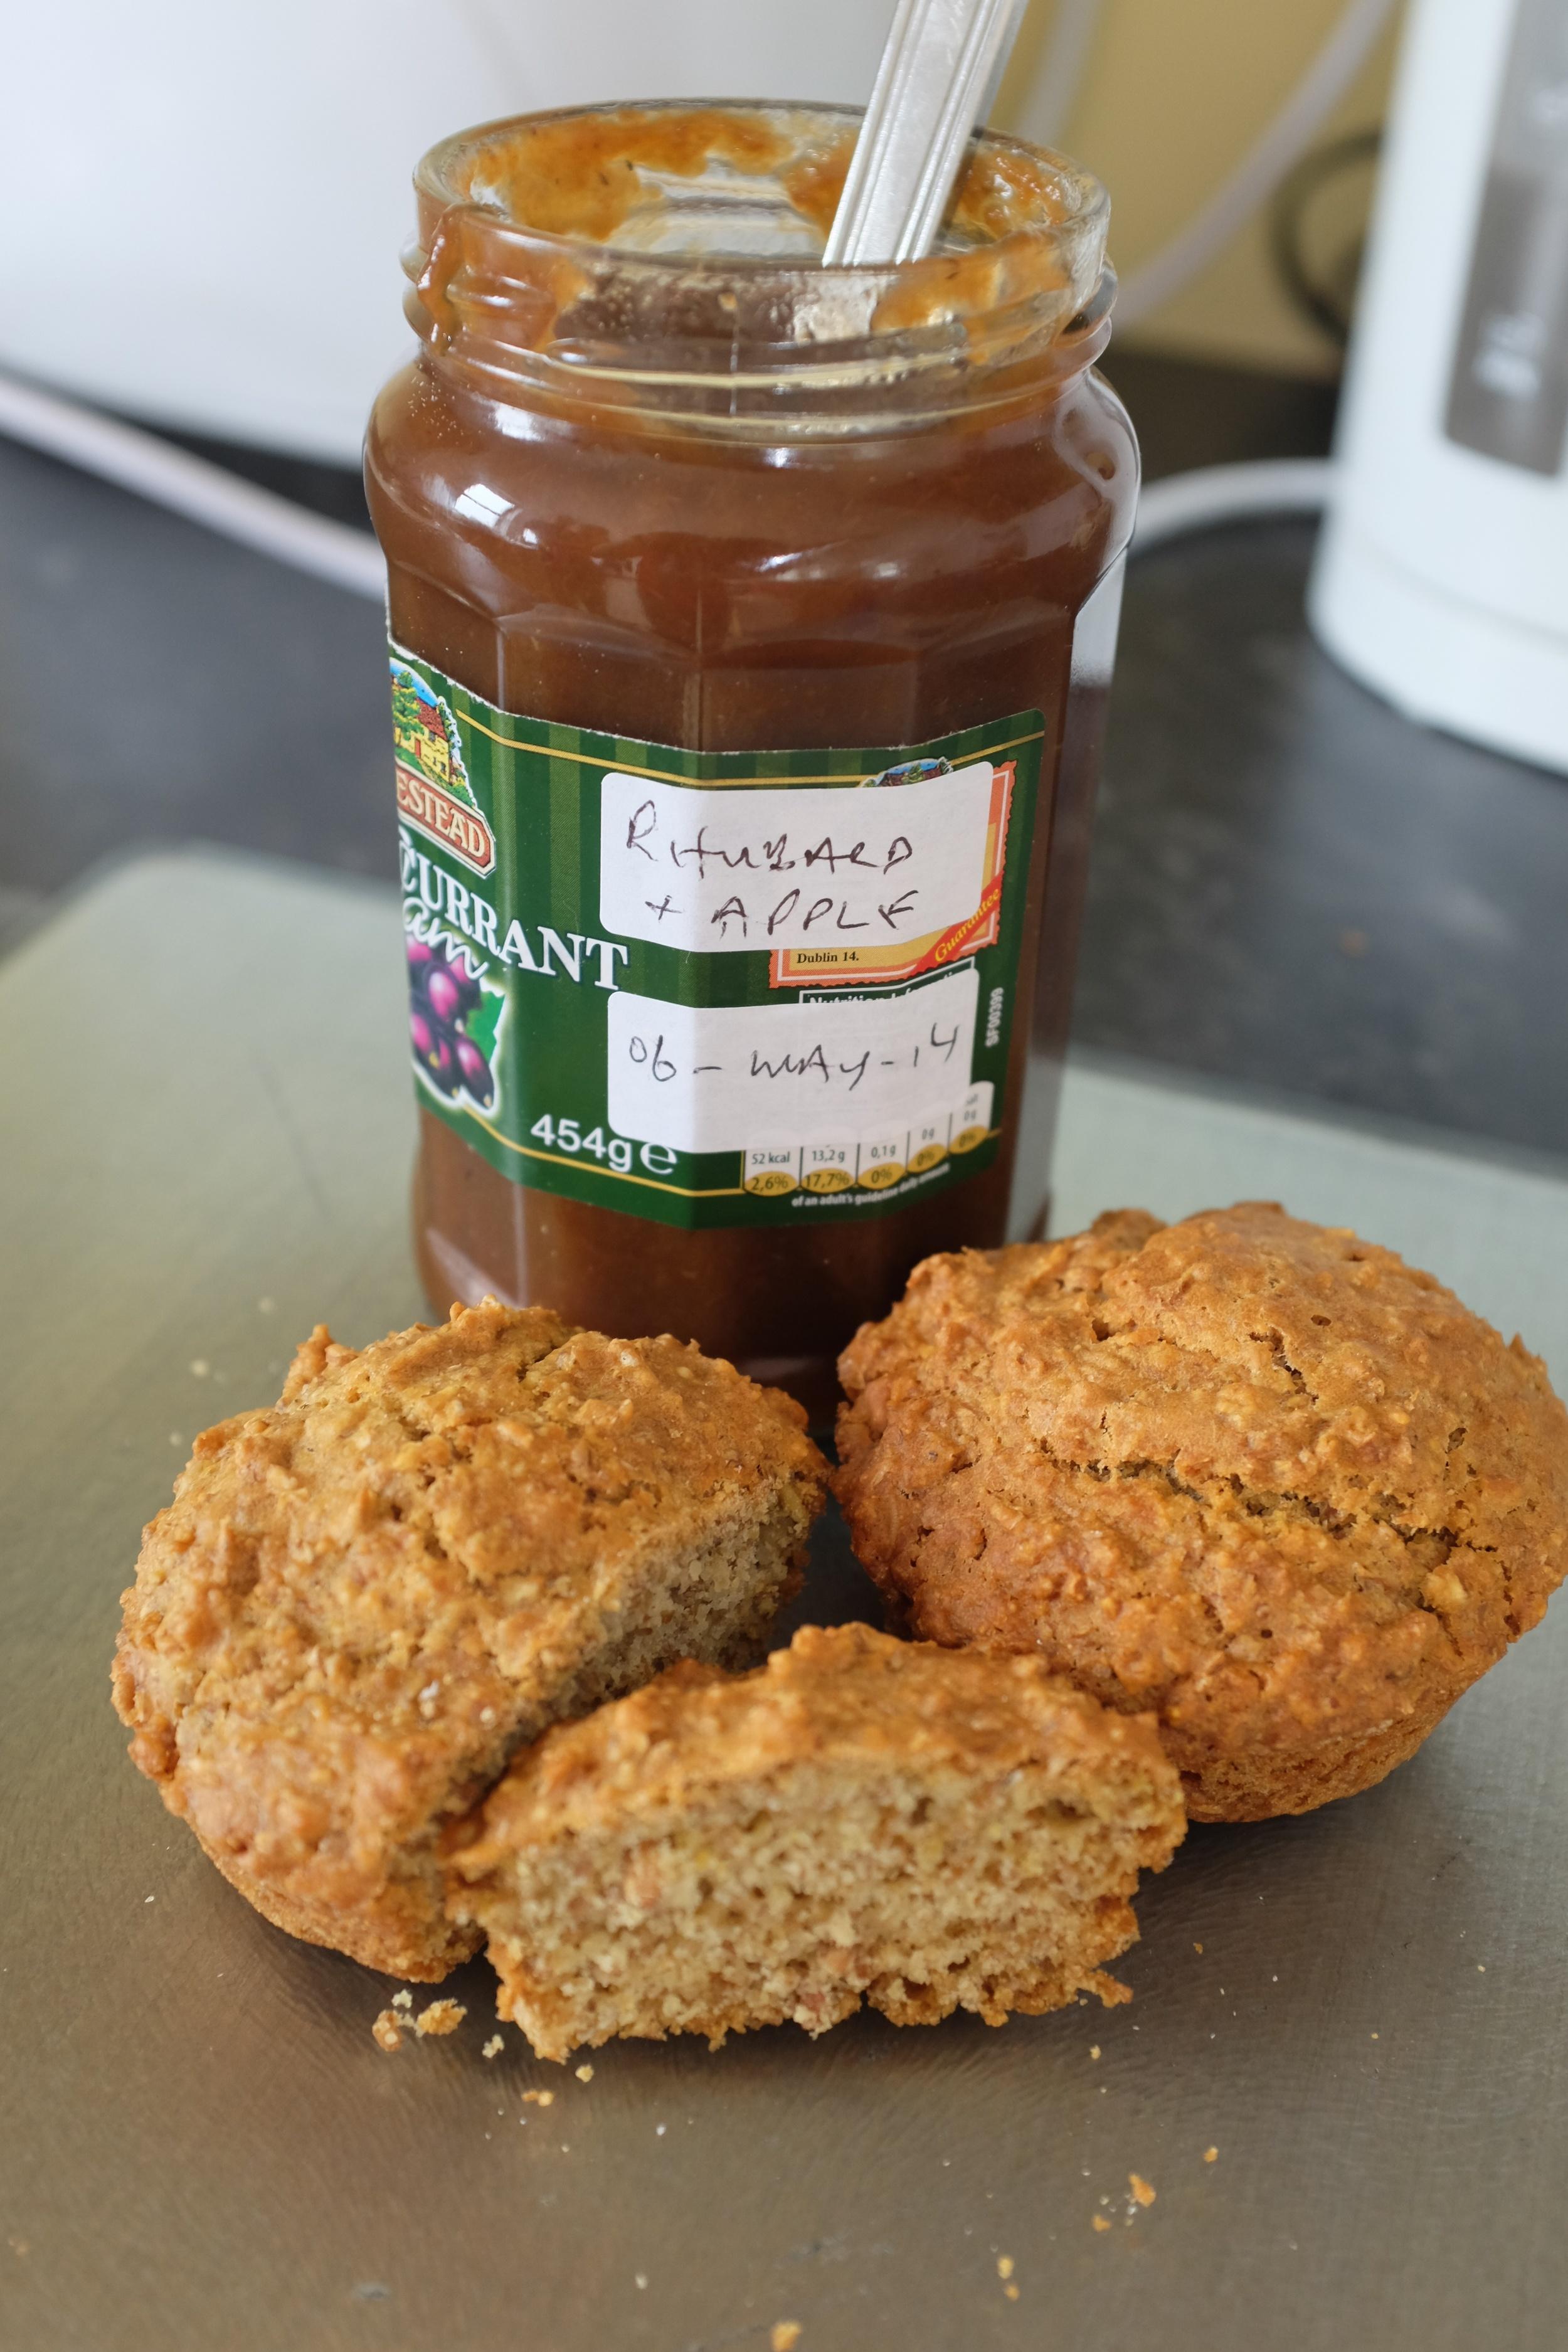 Brown Irish Soda Bread & Rhubarb and Apple Jam